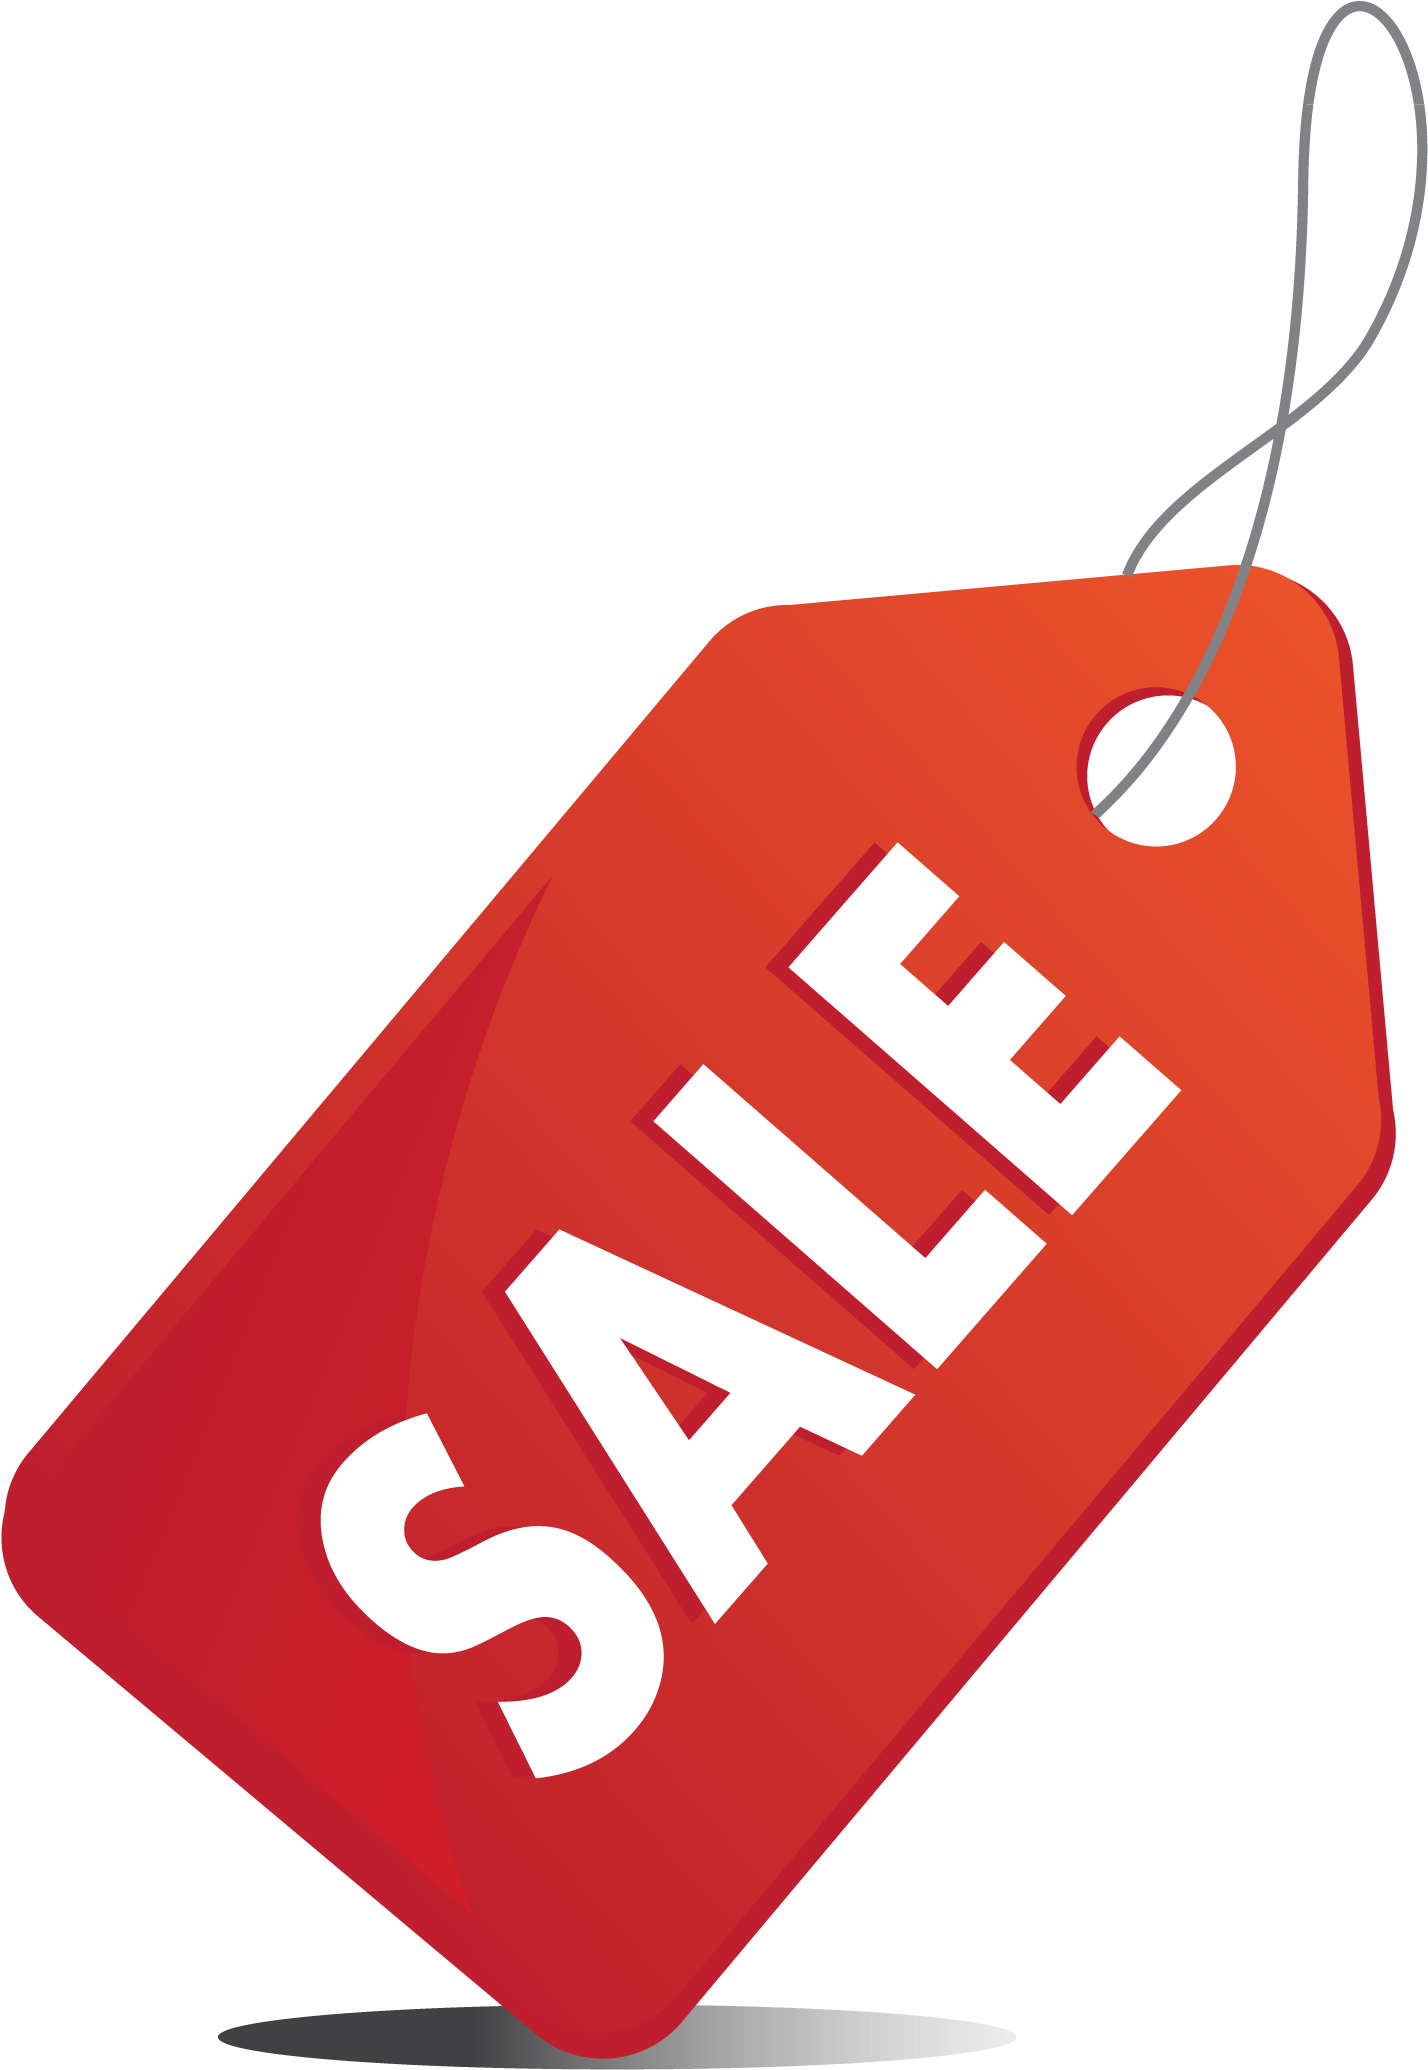 On Sale Now stock illustration. Illustration of